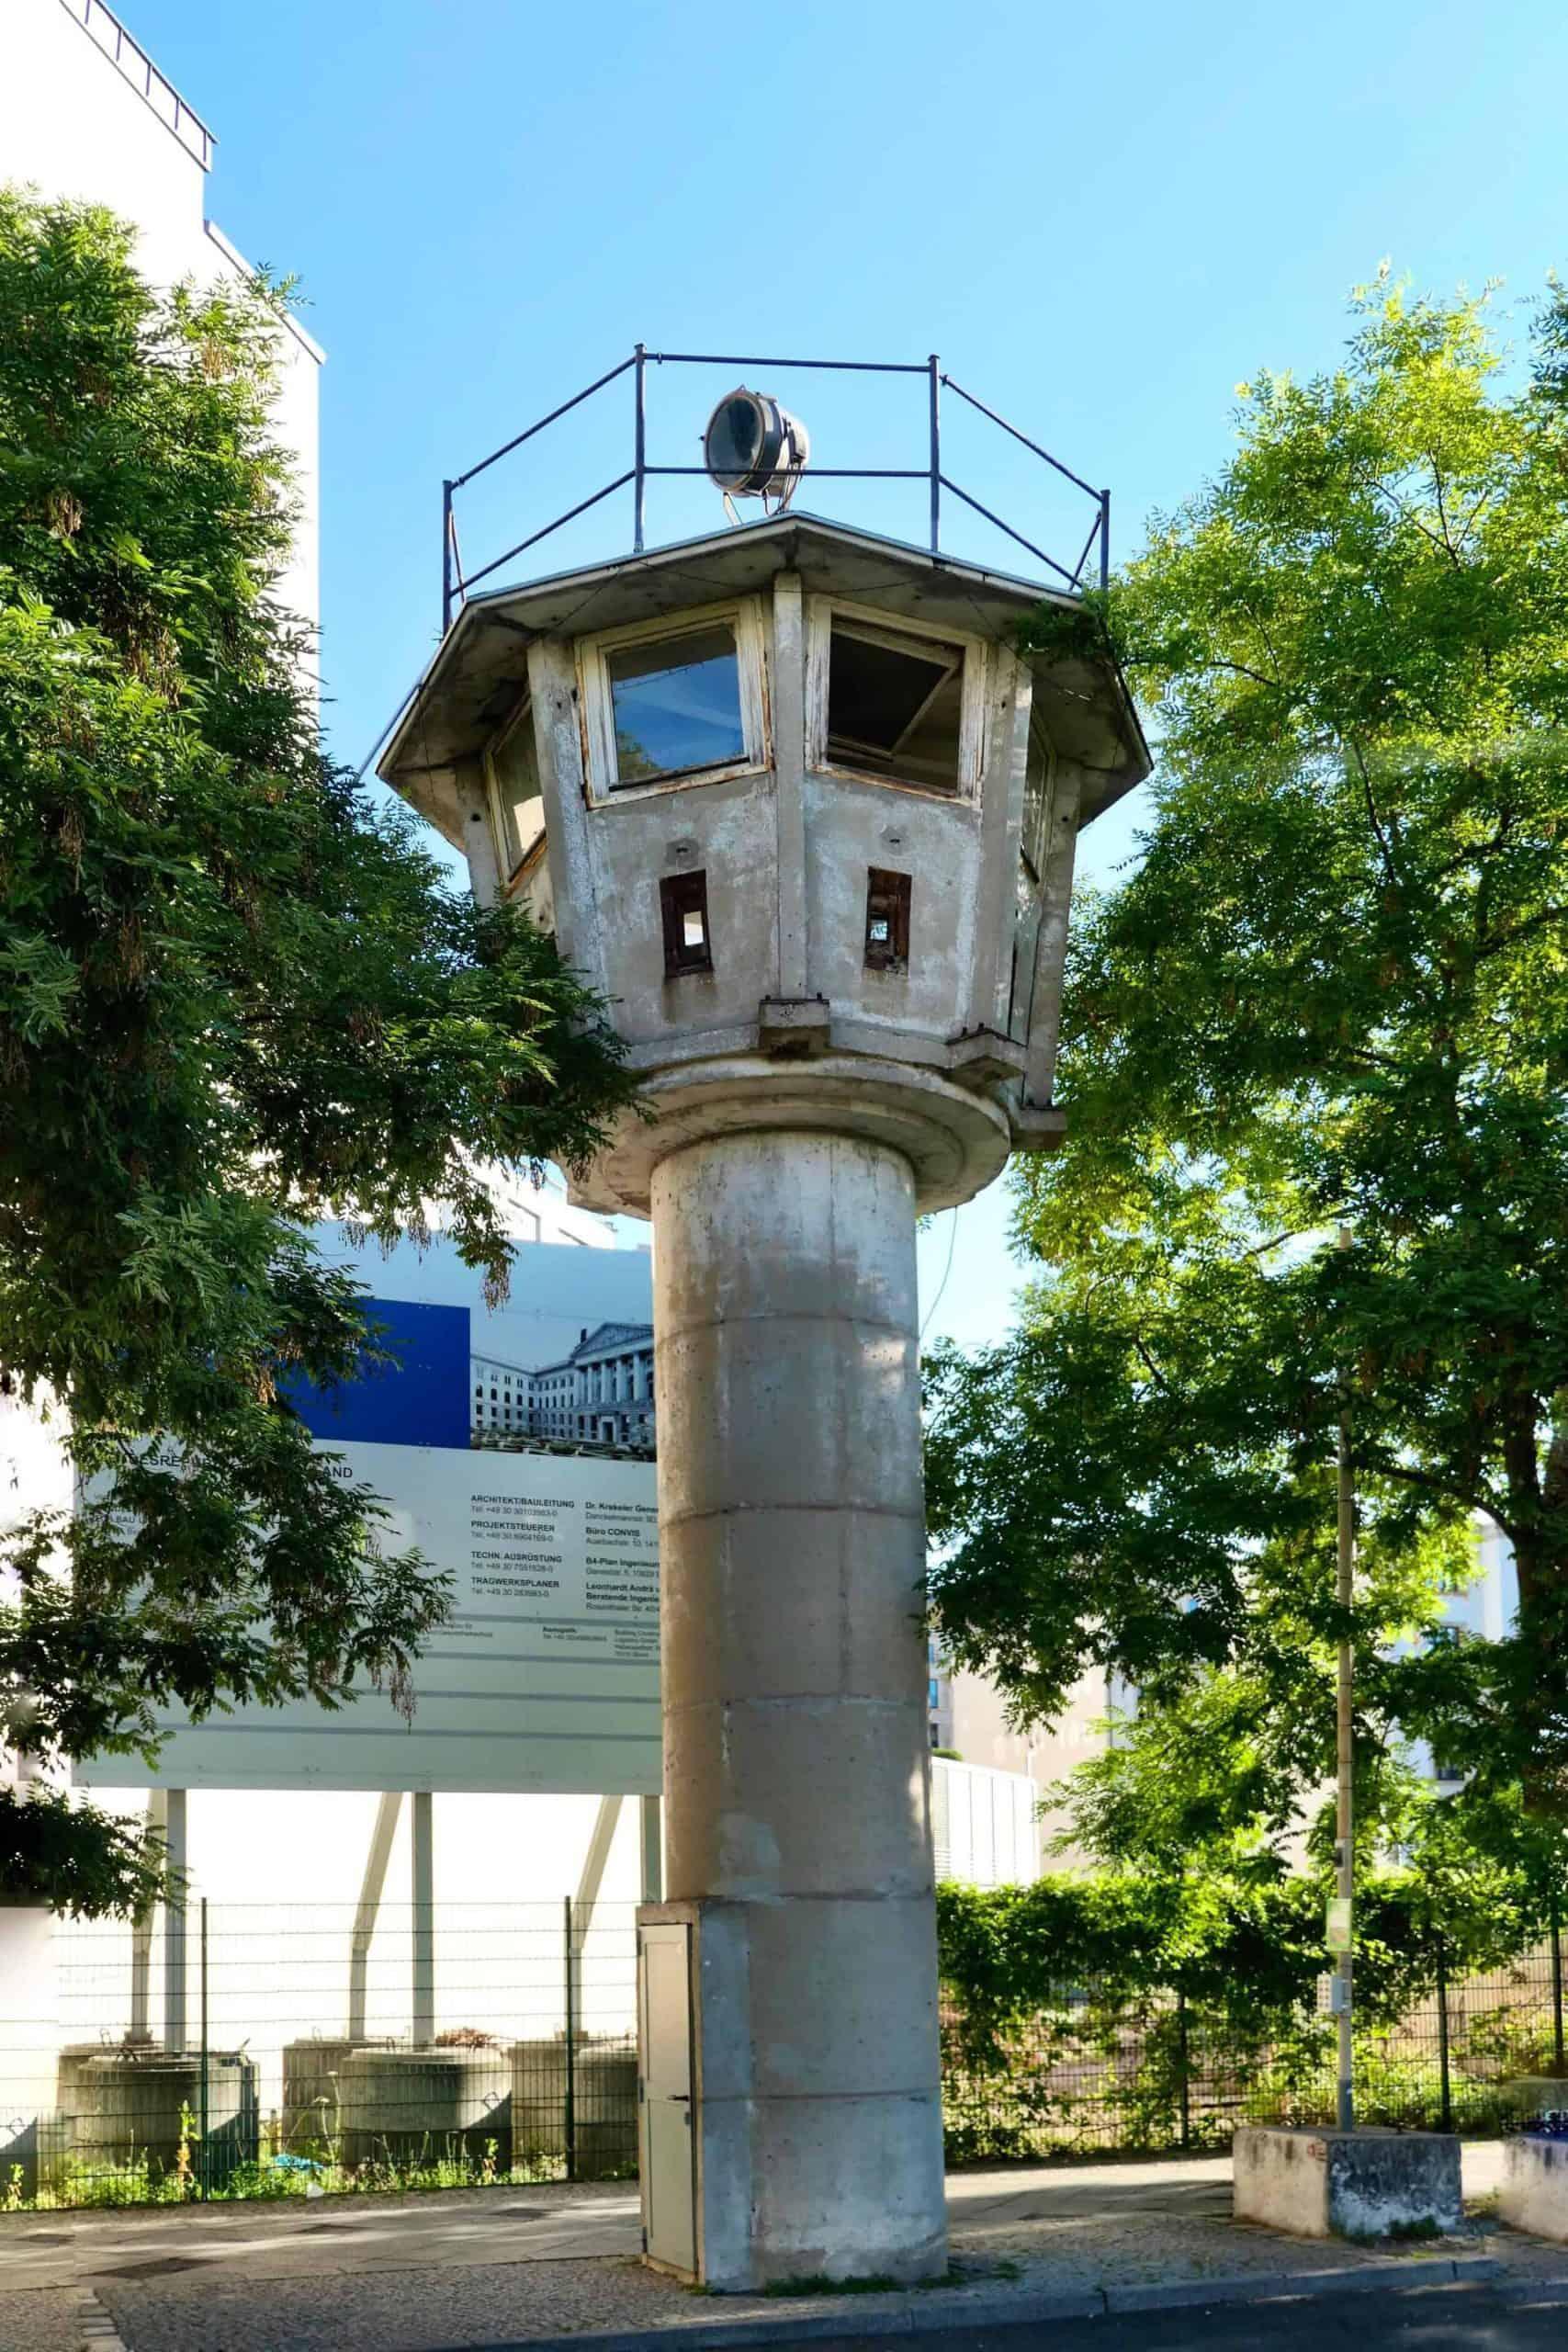 BerlinTour_JeffO_GDRWatchtower_Stop2